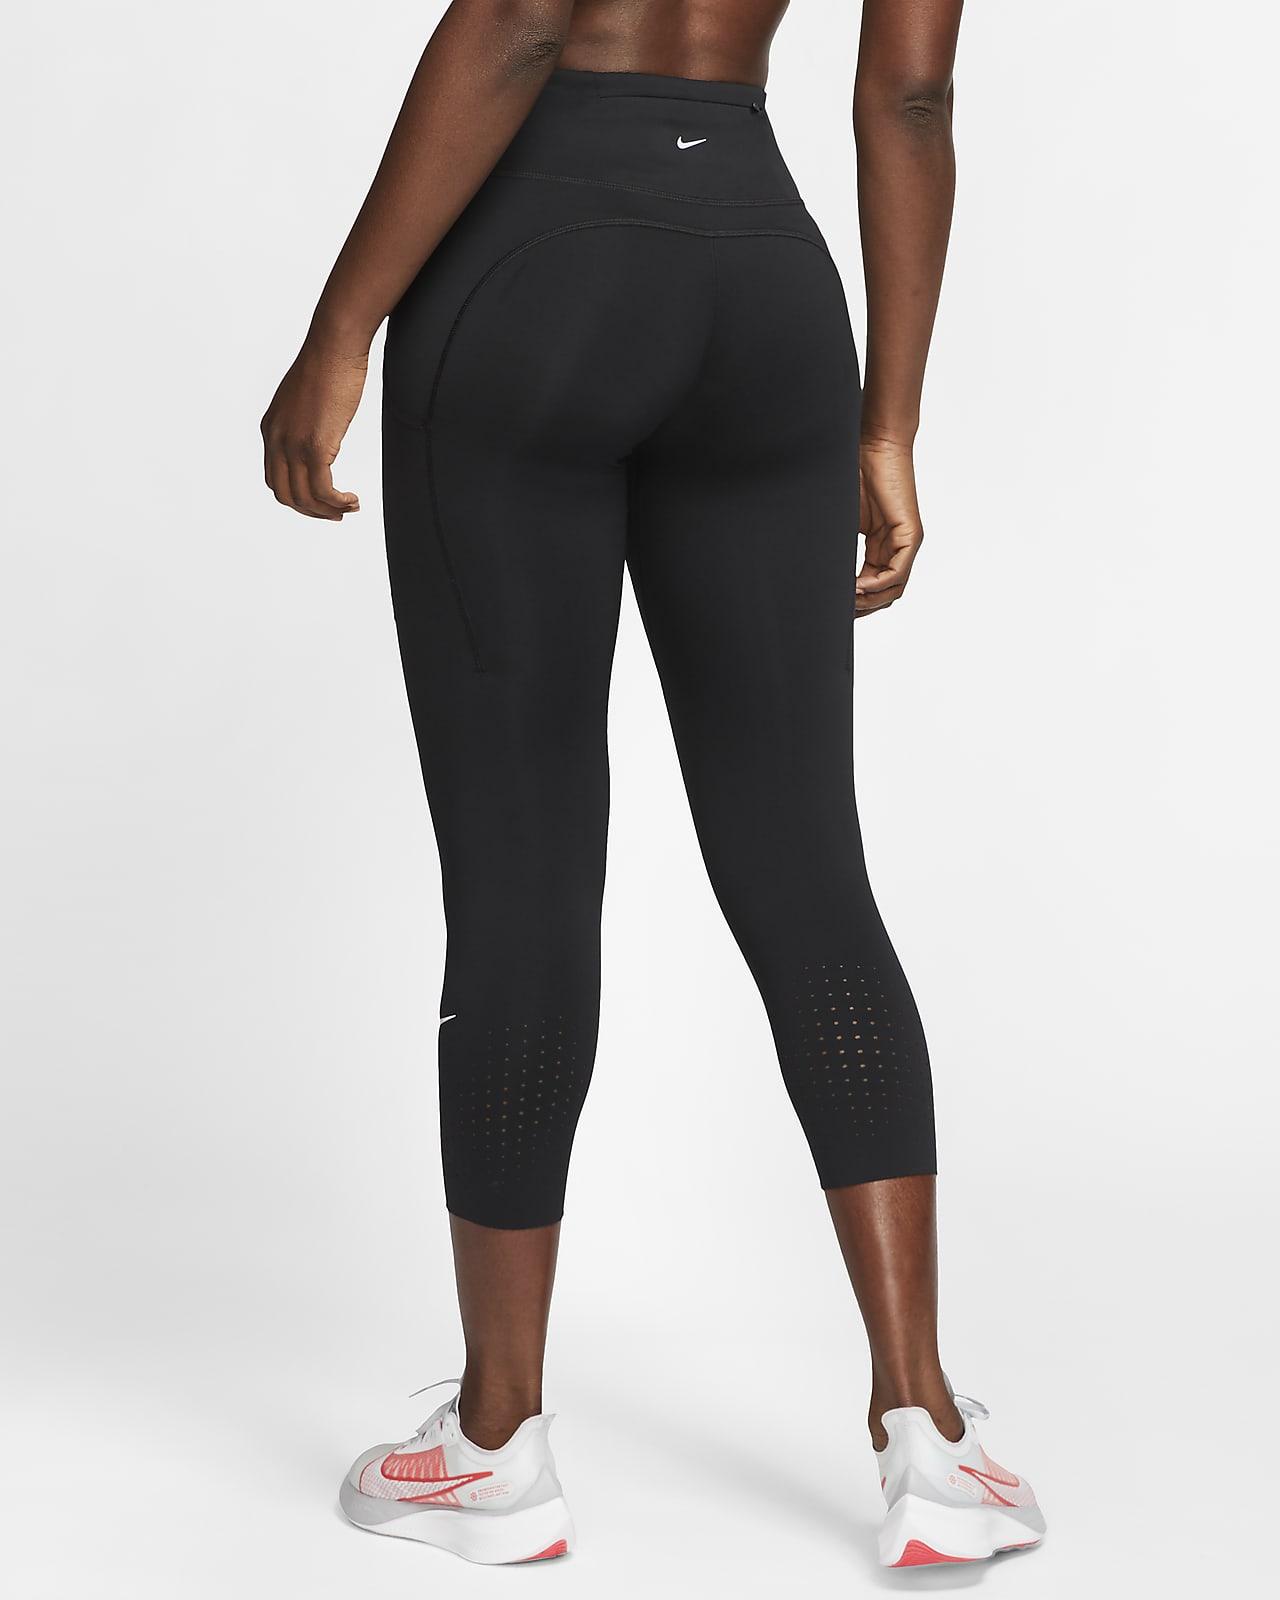 Nike Epic Luxe Women's Running Crop